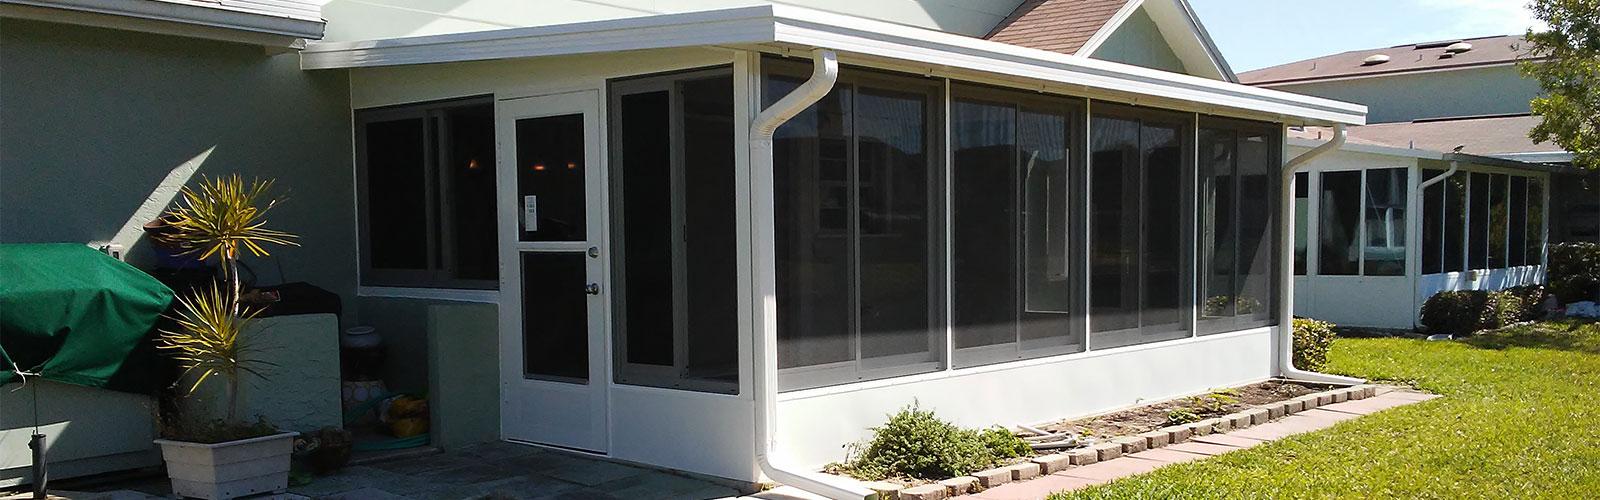 patio screen enclosures in melbourne fl